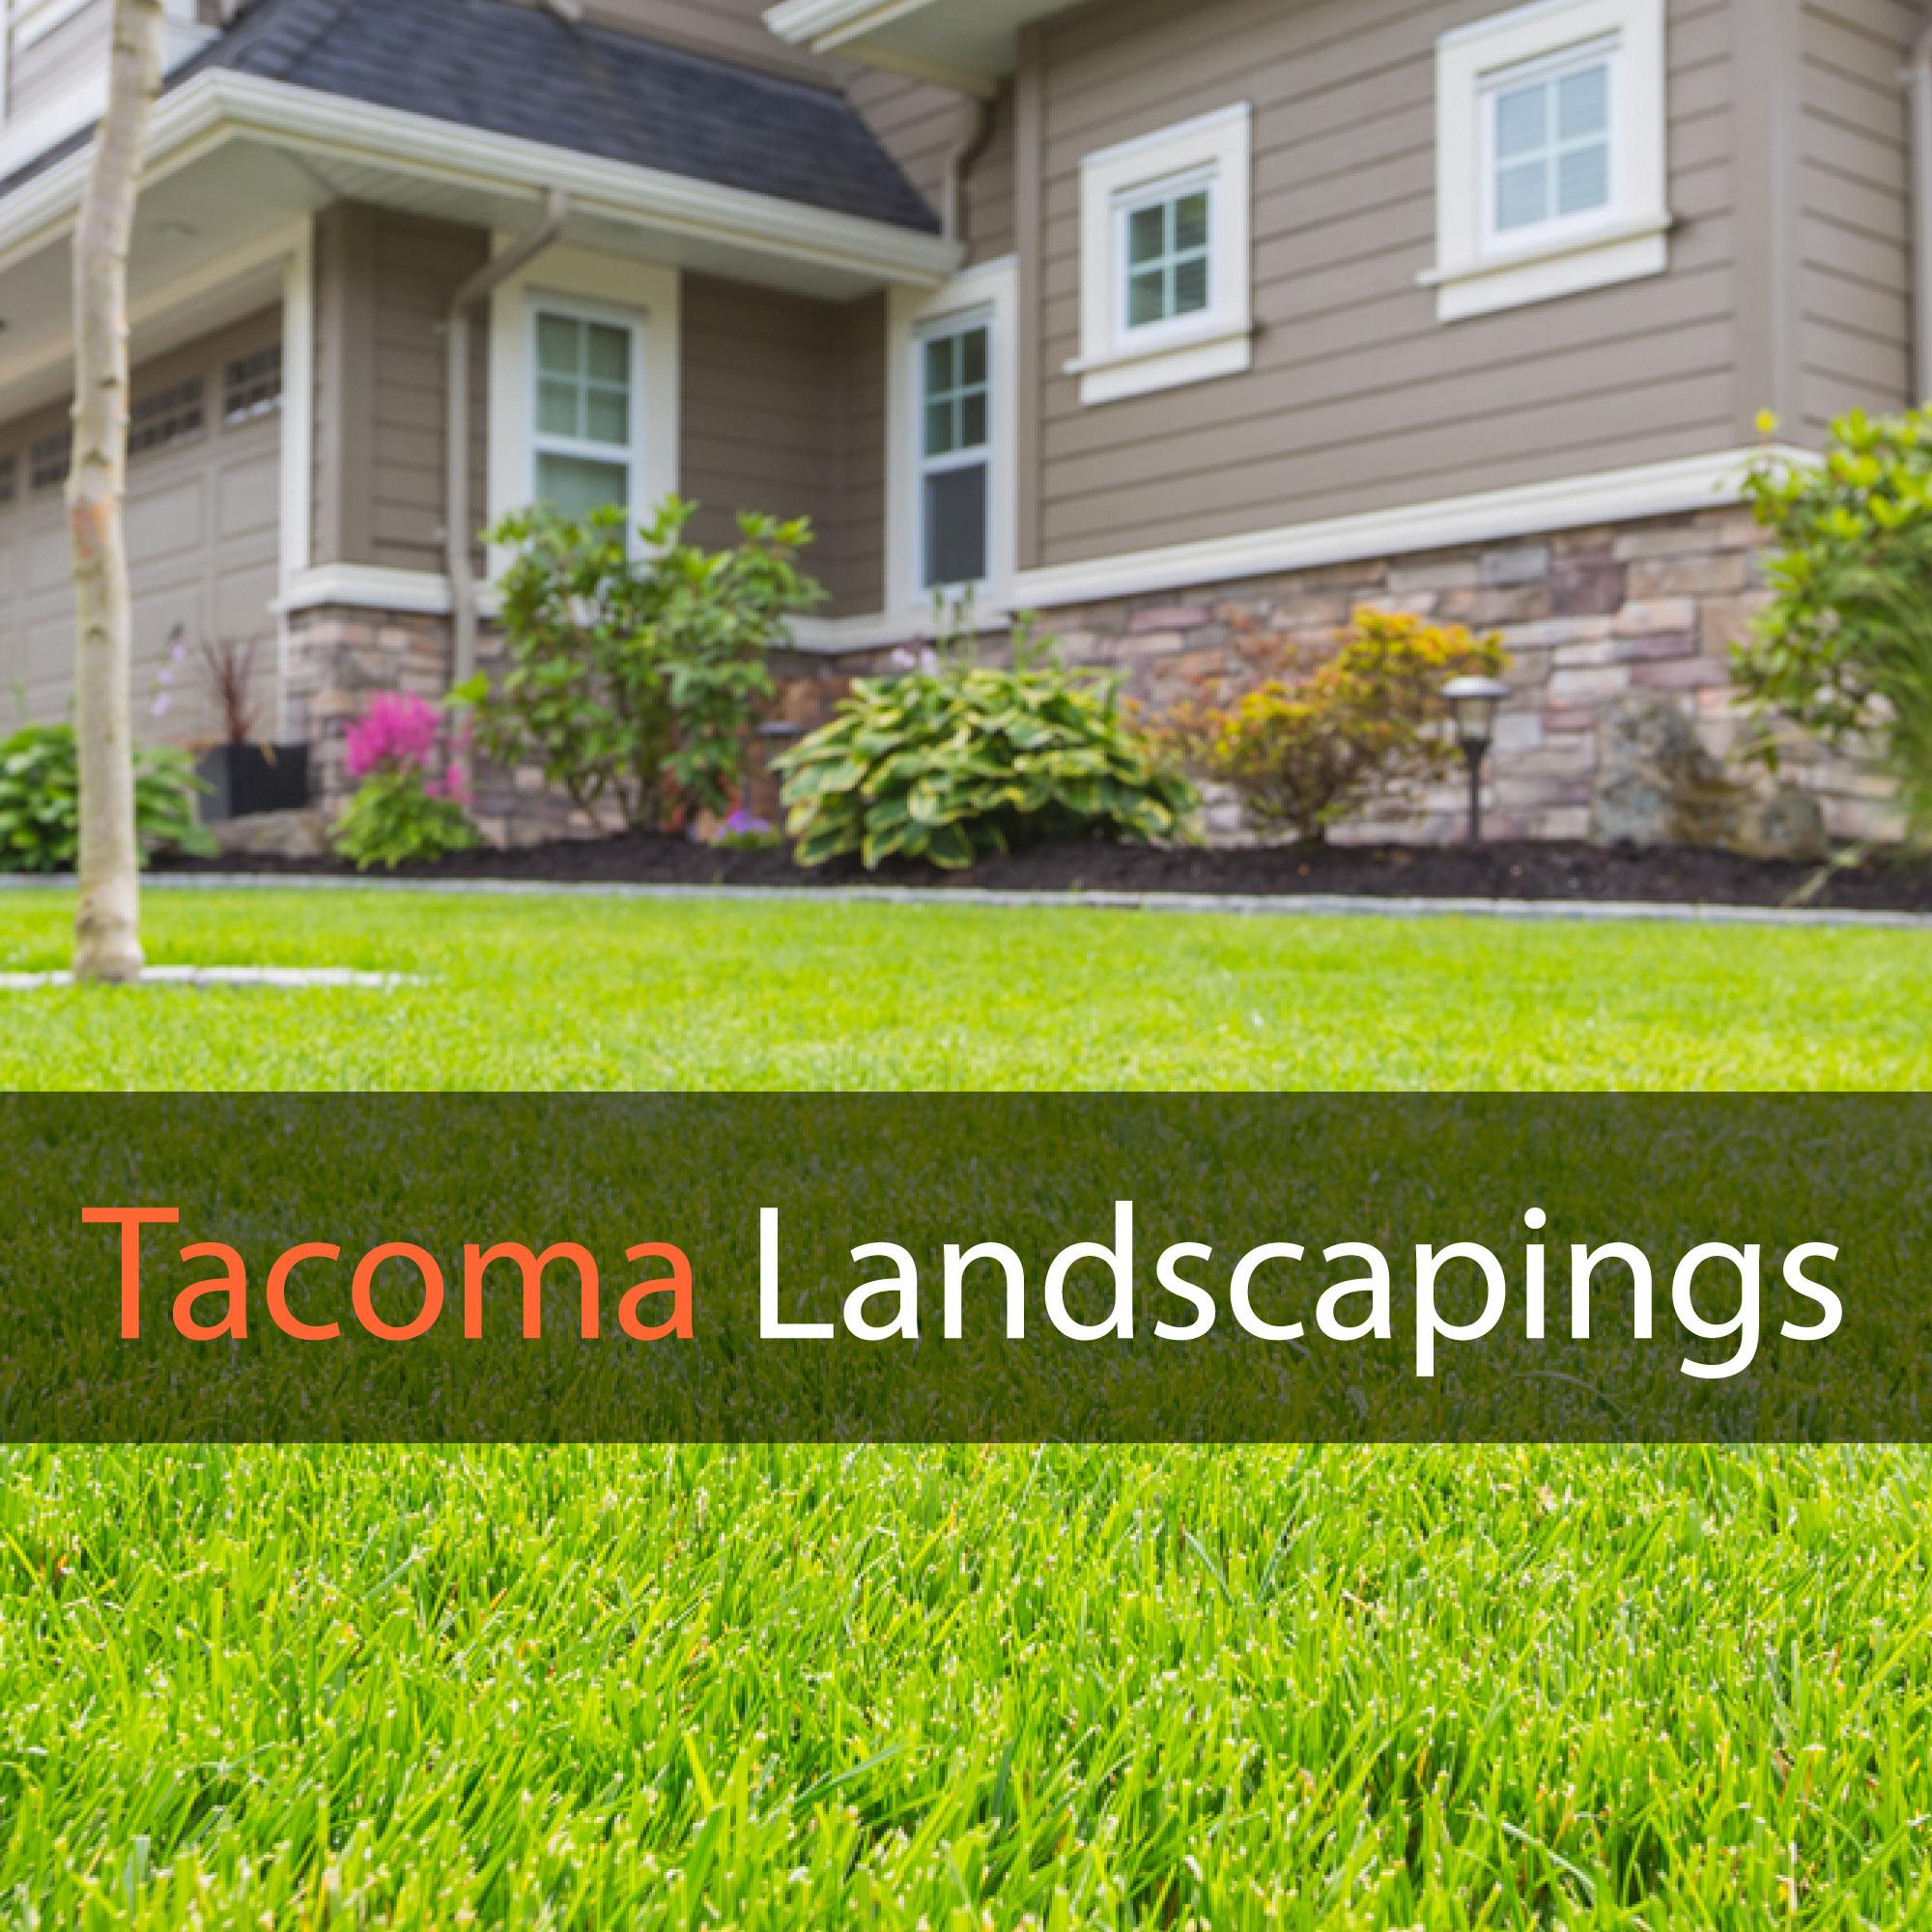 Tacoma-Landscapings-FB-Profile.jpg